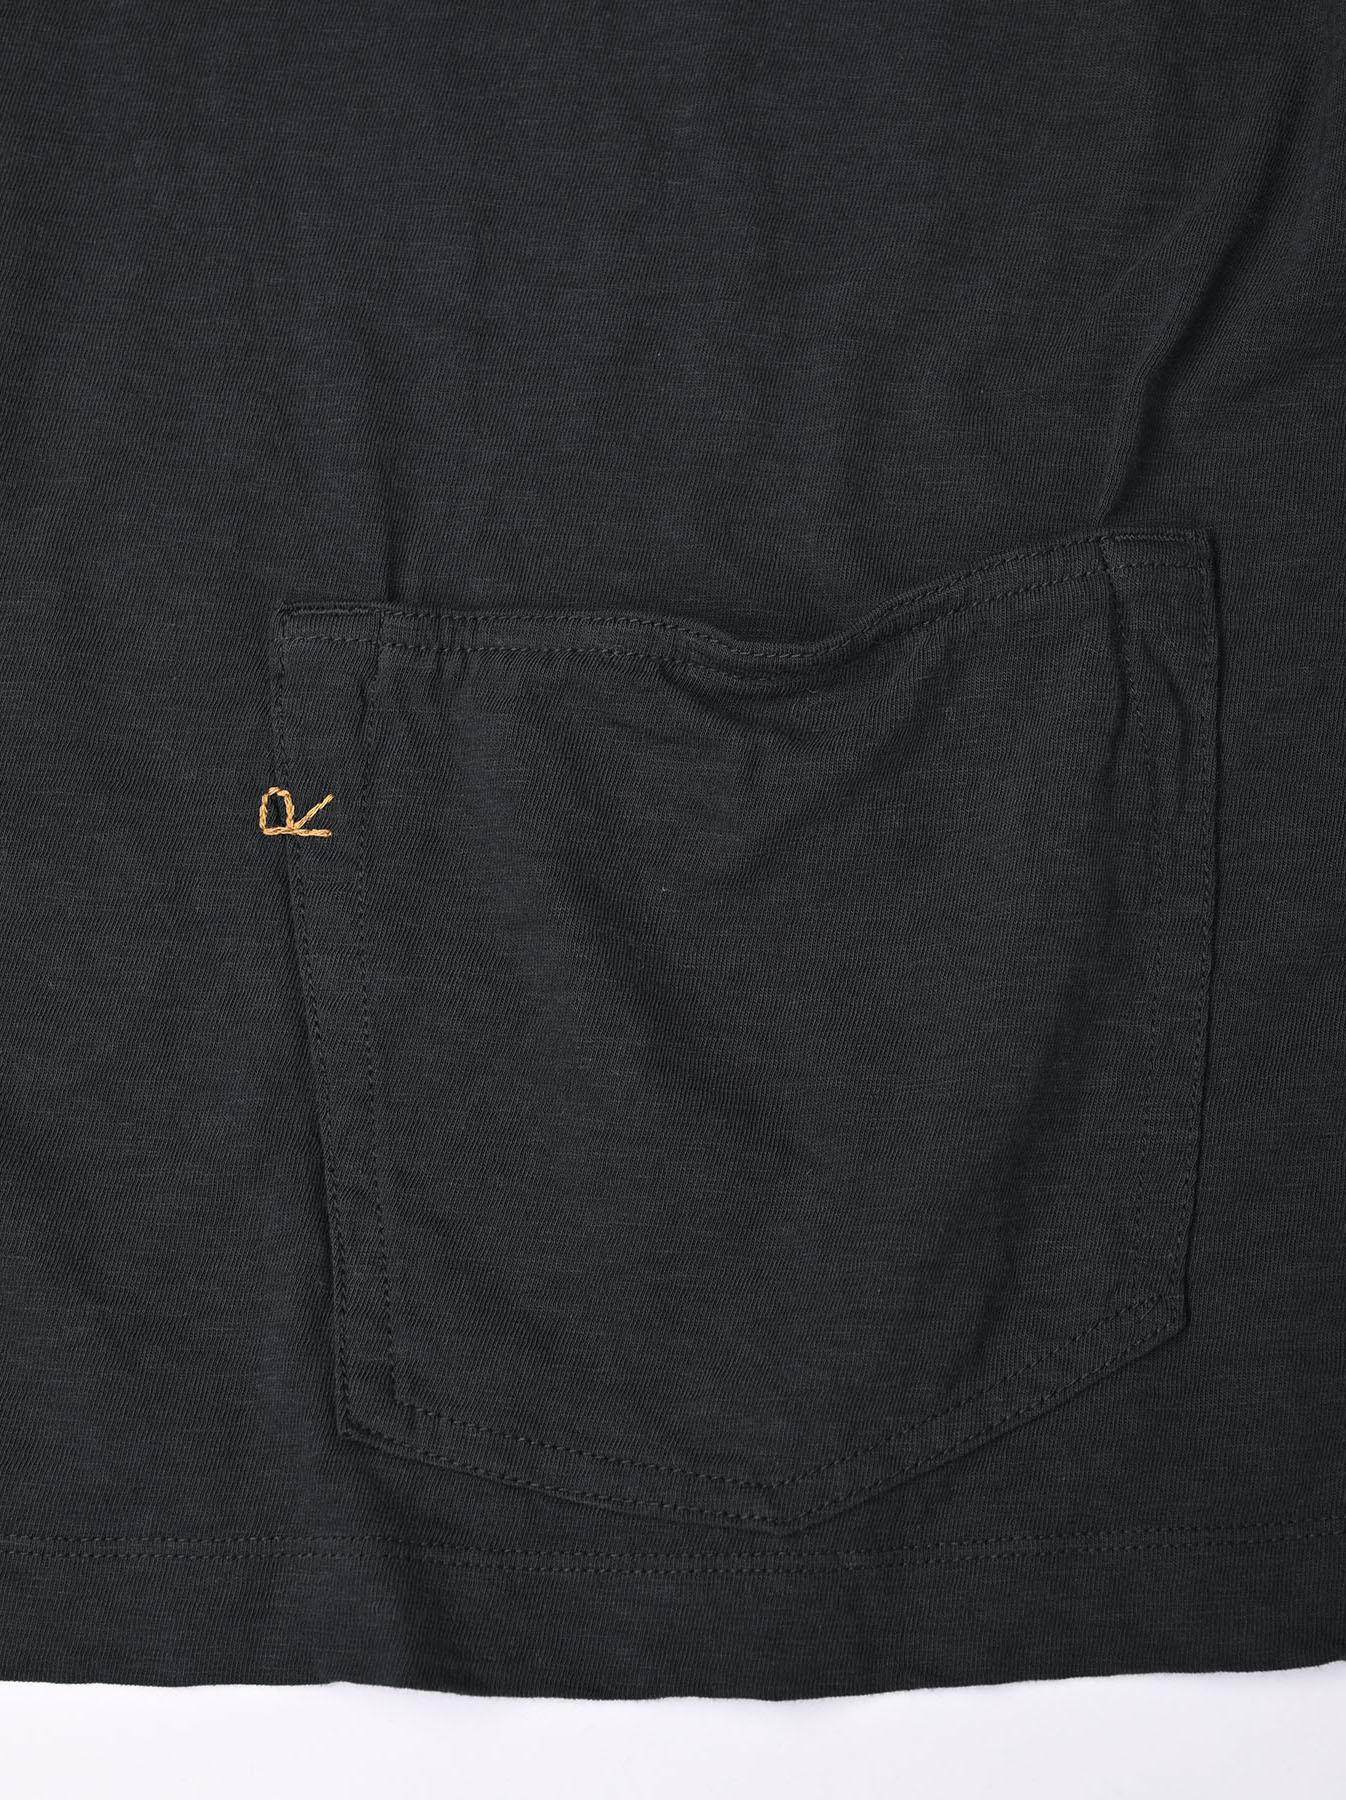 Zimbabwe Cotton Ocean Long-sleeved T-shirt-11